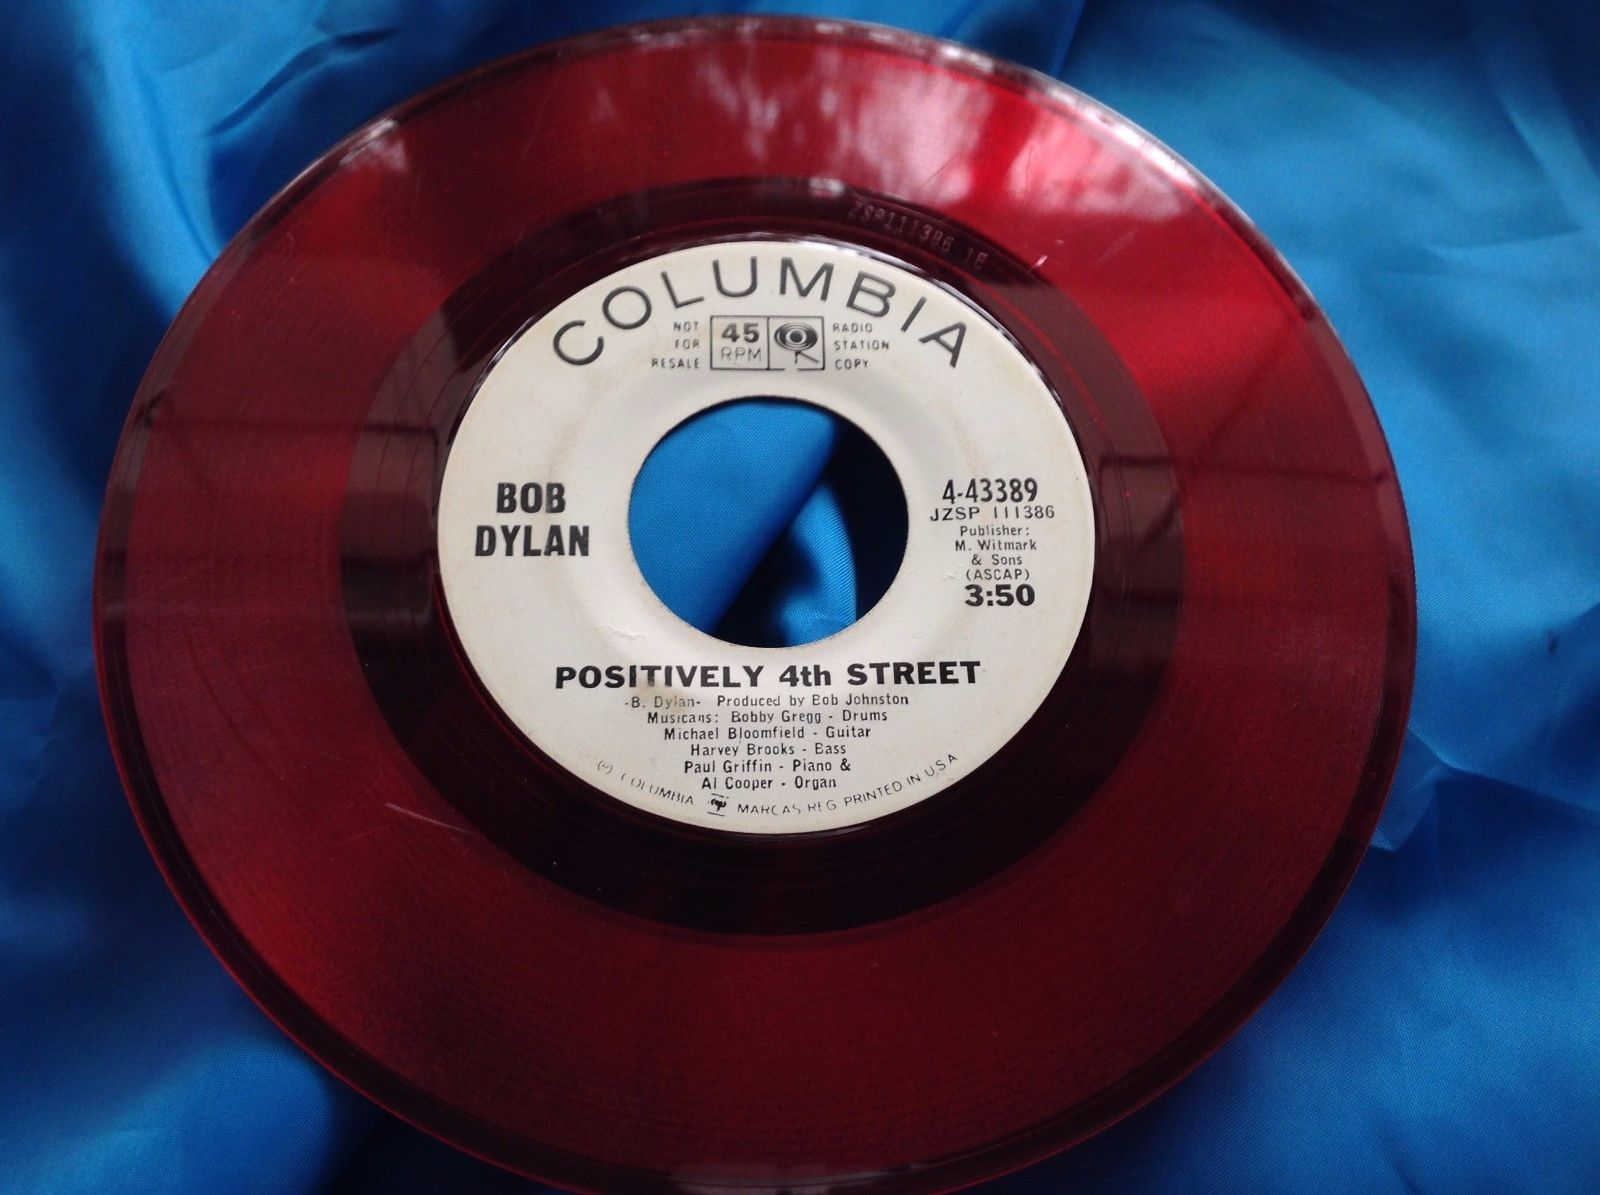 Rare Wlp Red Vinyl Promo 45 Bob Dylan Positively 4th Street Columbia 43389 Bob Dylan Dylan Vinyl